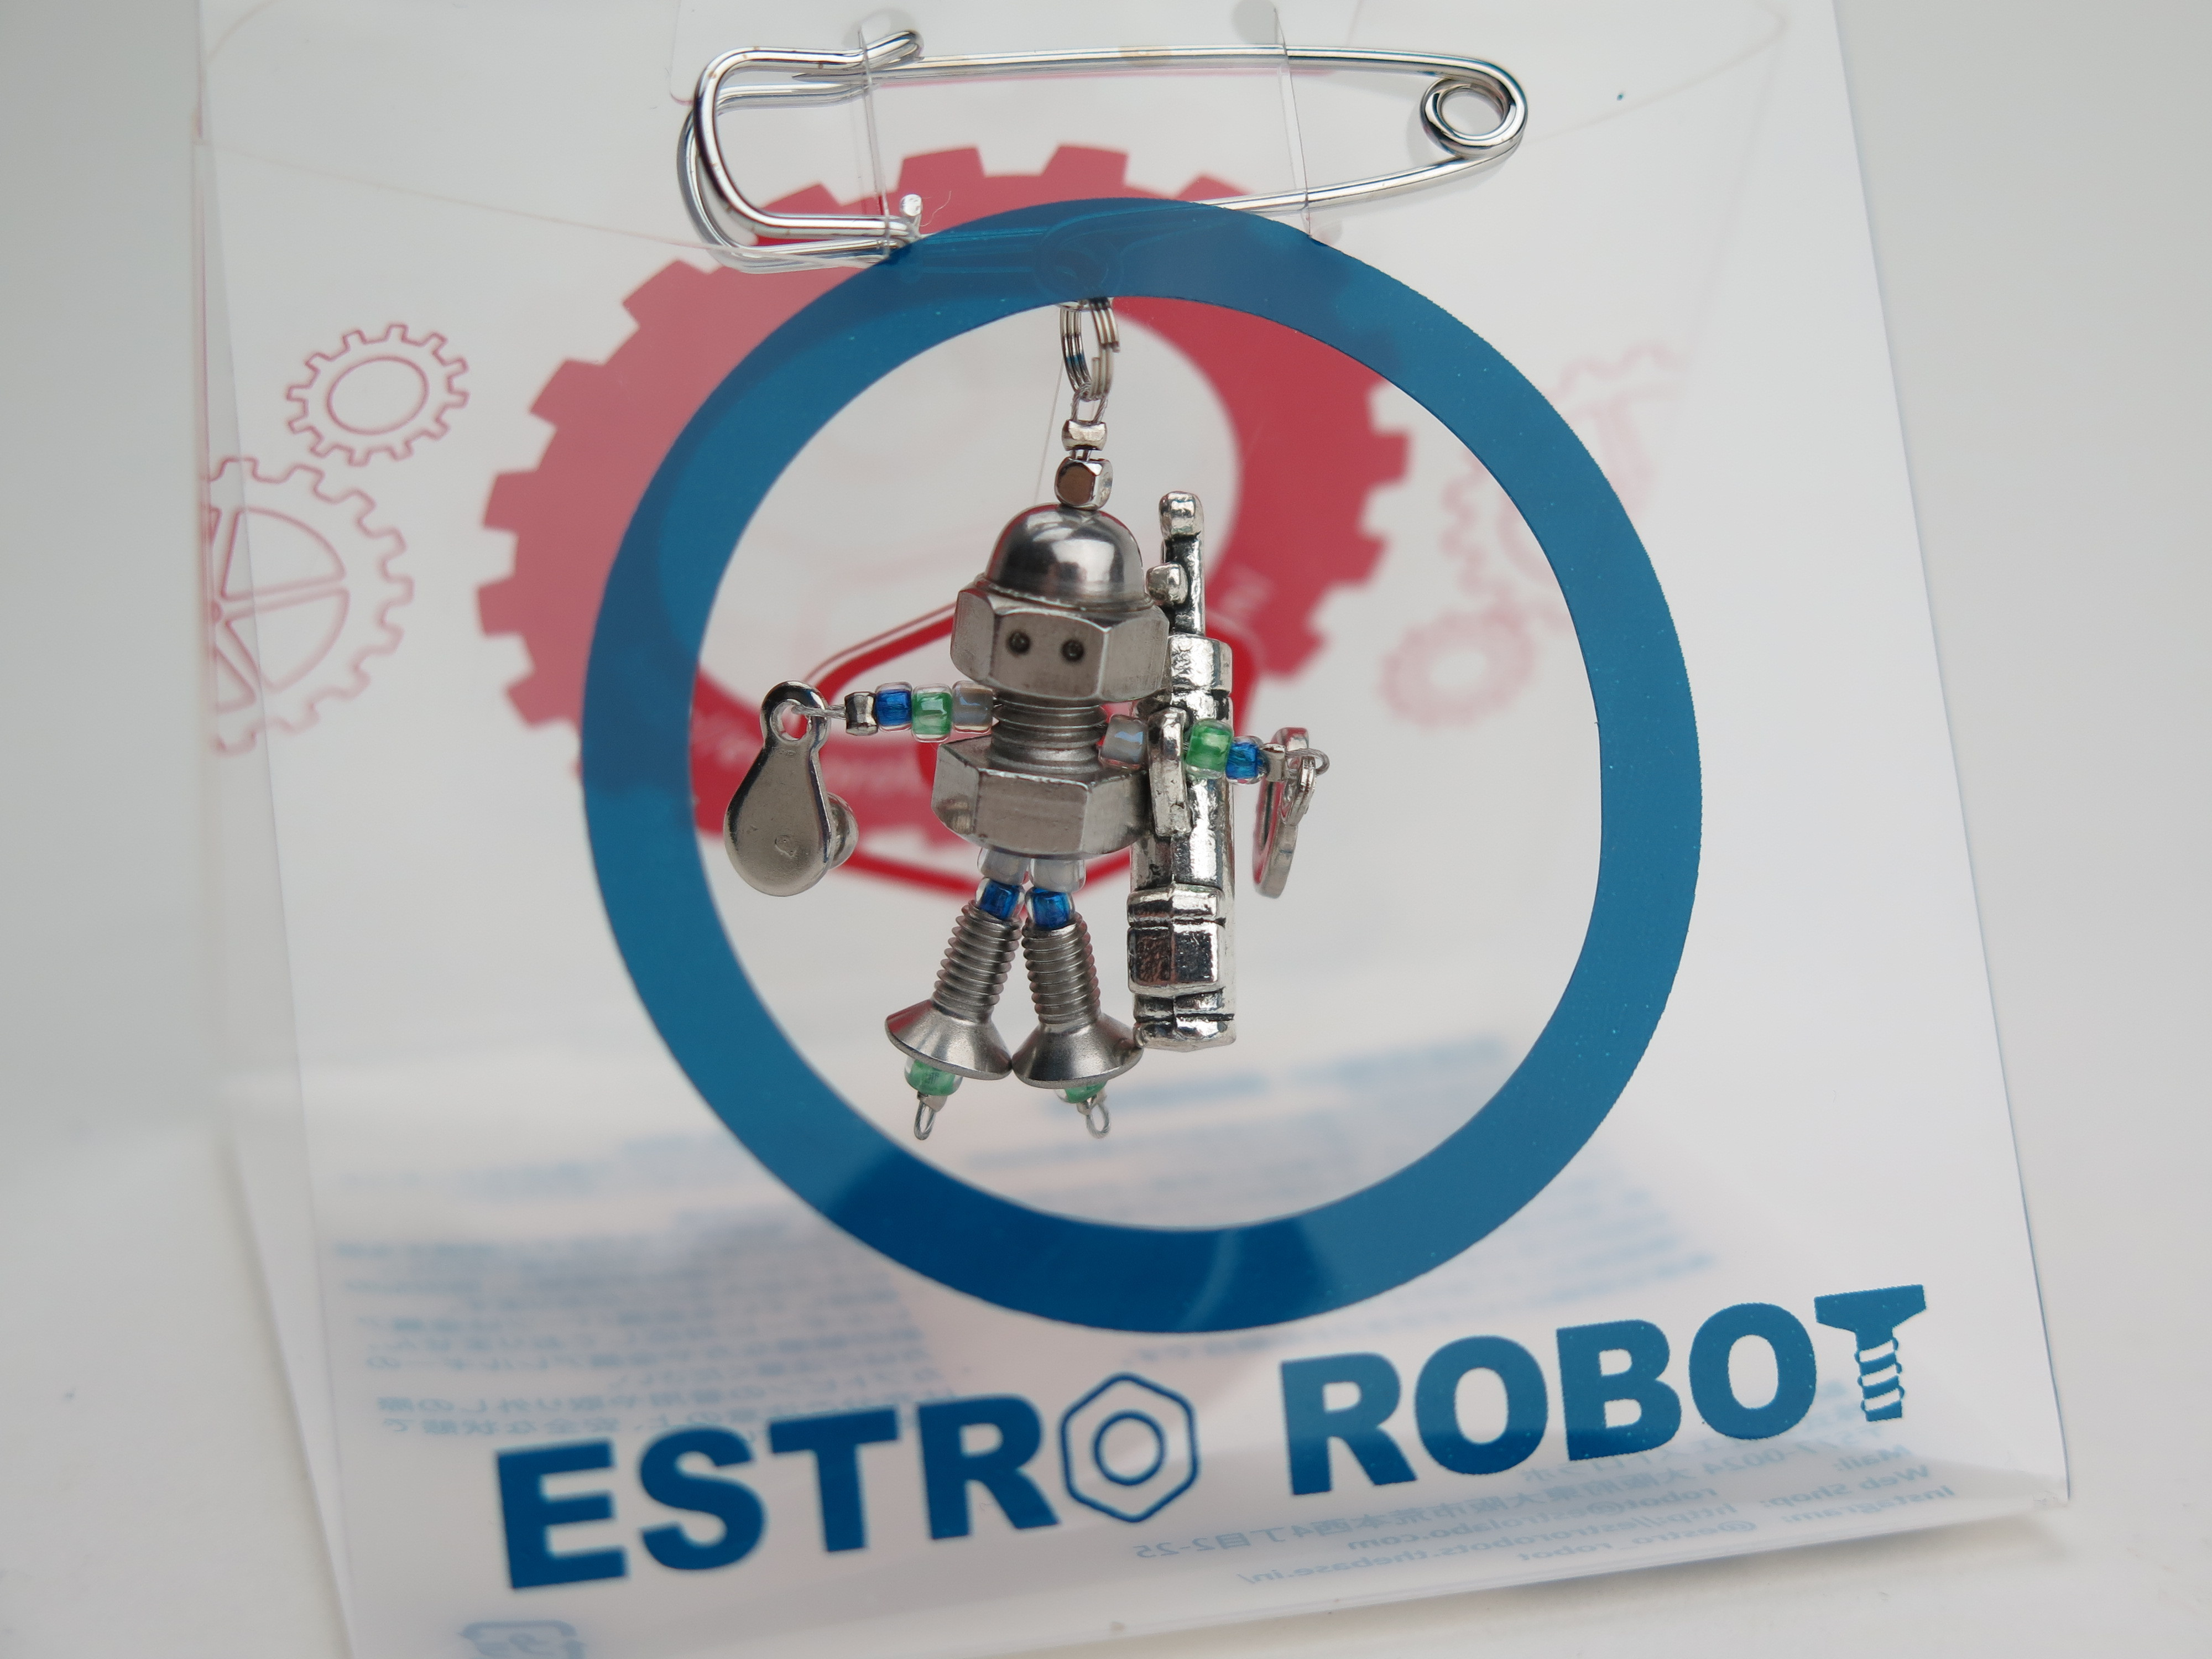 estro robot golf blue-green ゴルフ ブルーグリーン